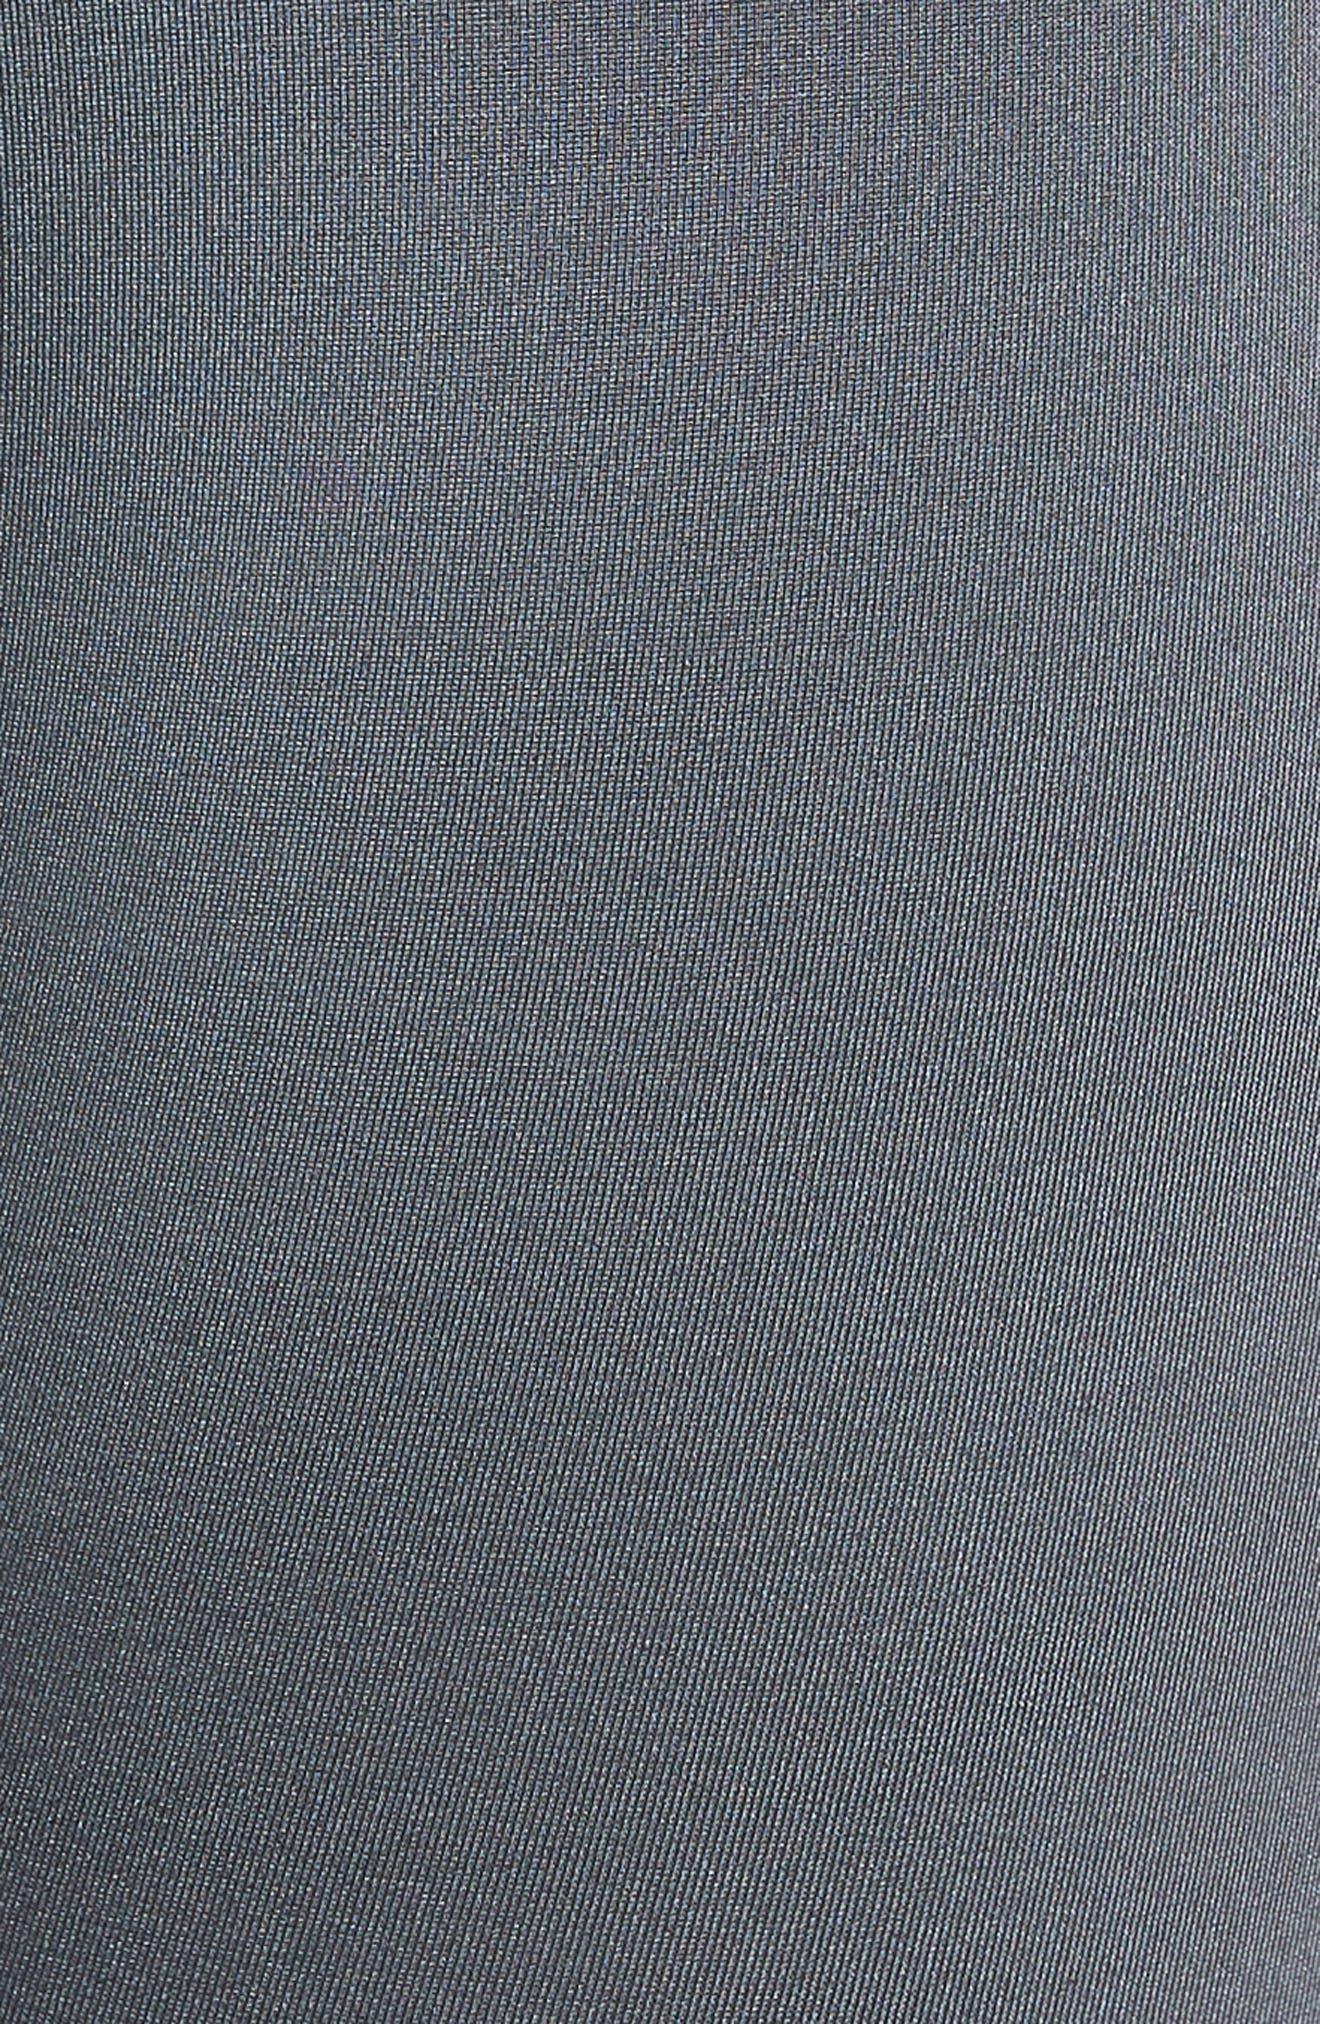 360 2.0 Boxer Briefs,                             Alternate thumbnail 5, color,                             TURBULENCE/ BLACK